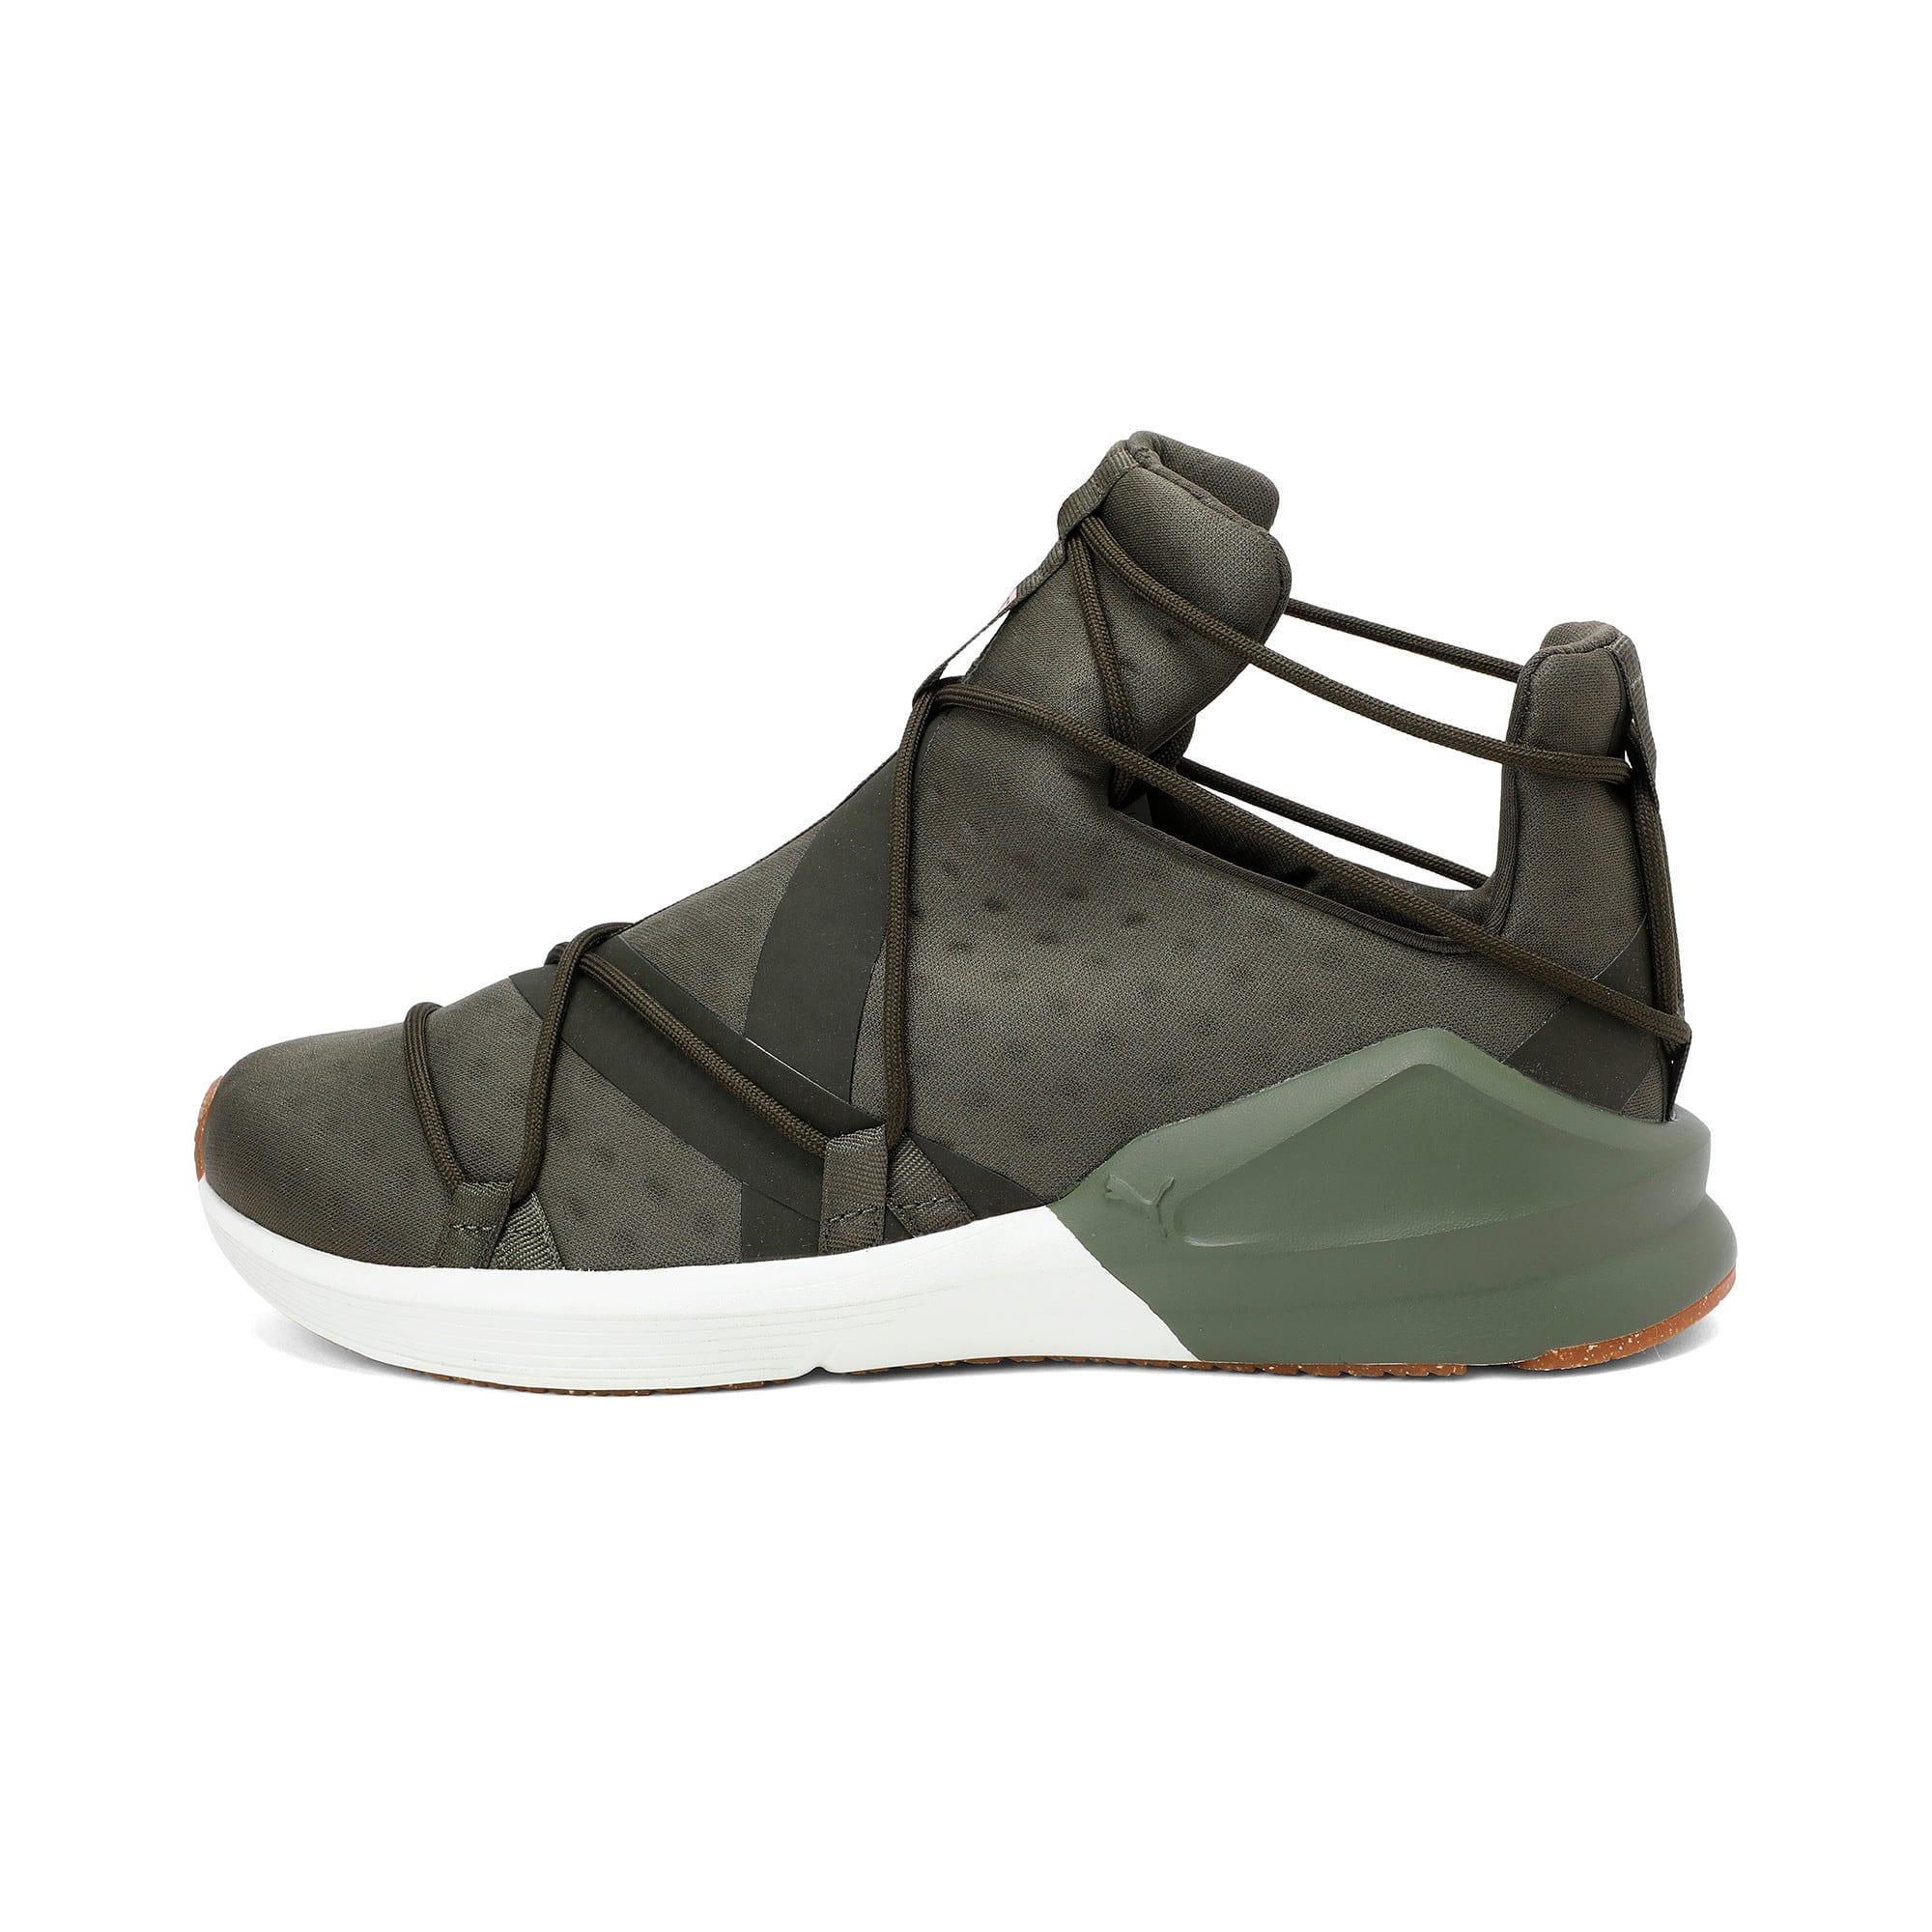 Thumbnail 1 of Fierce Rope VR Women's Training Shoes, Olive Night-Whisper White, medium-IND